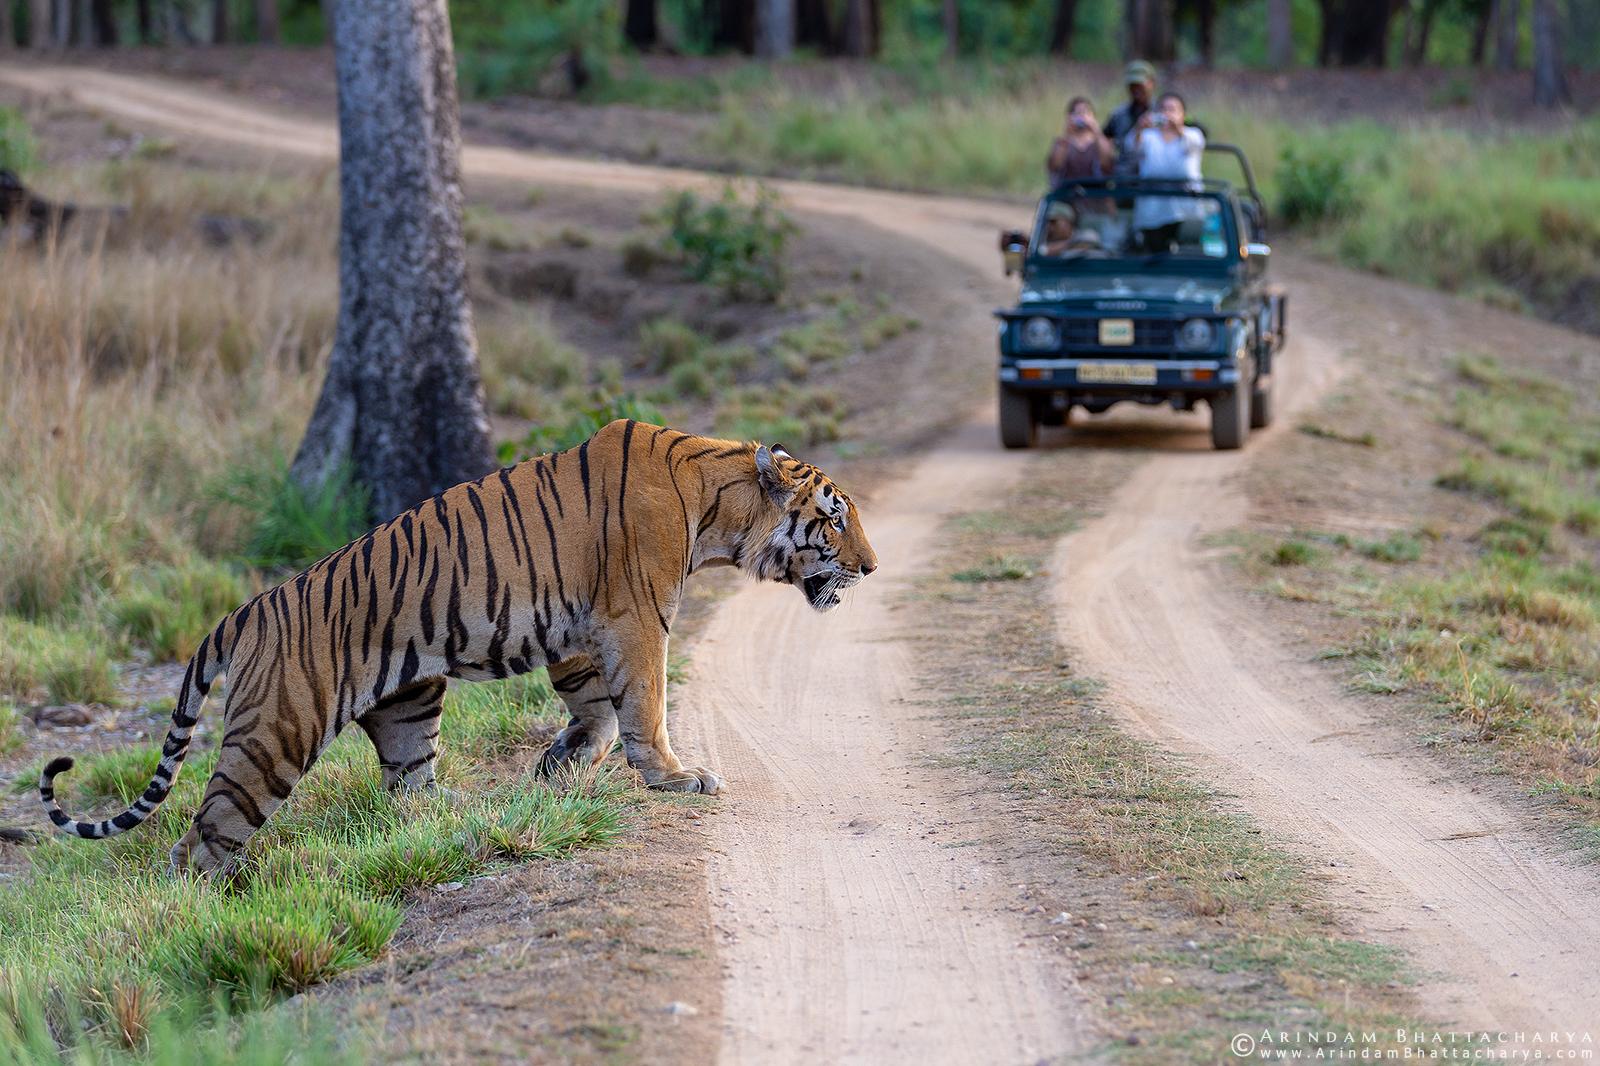 Royal Bengal Tiger or Panthera Tigris Tigris crossing road in front of tourists in Kanha national park, Madhya Pradesh, India